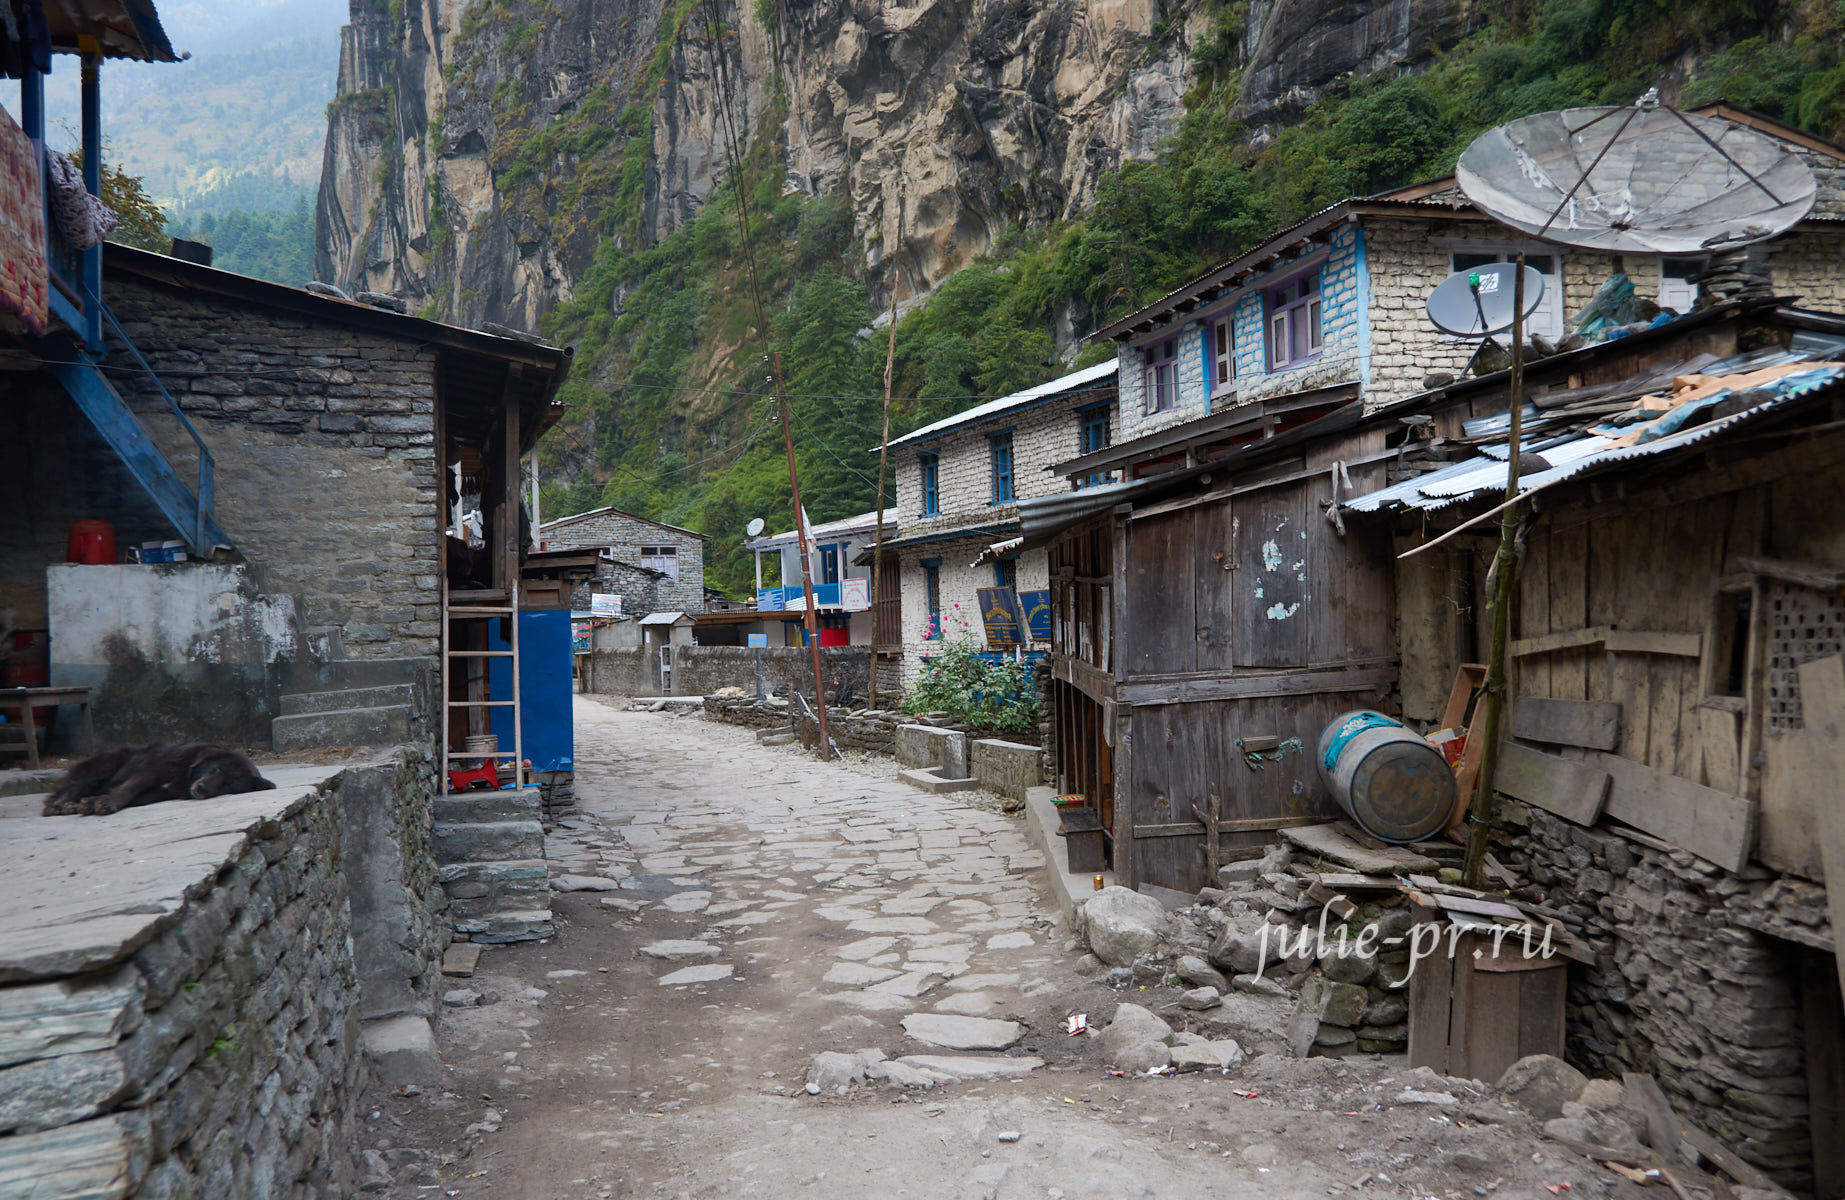 Непал, Трек вокруг Аннапурны, деревня Дхарапани